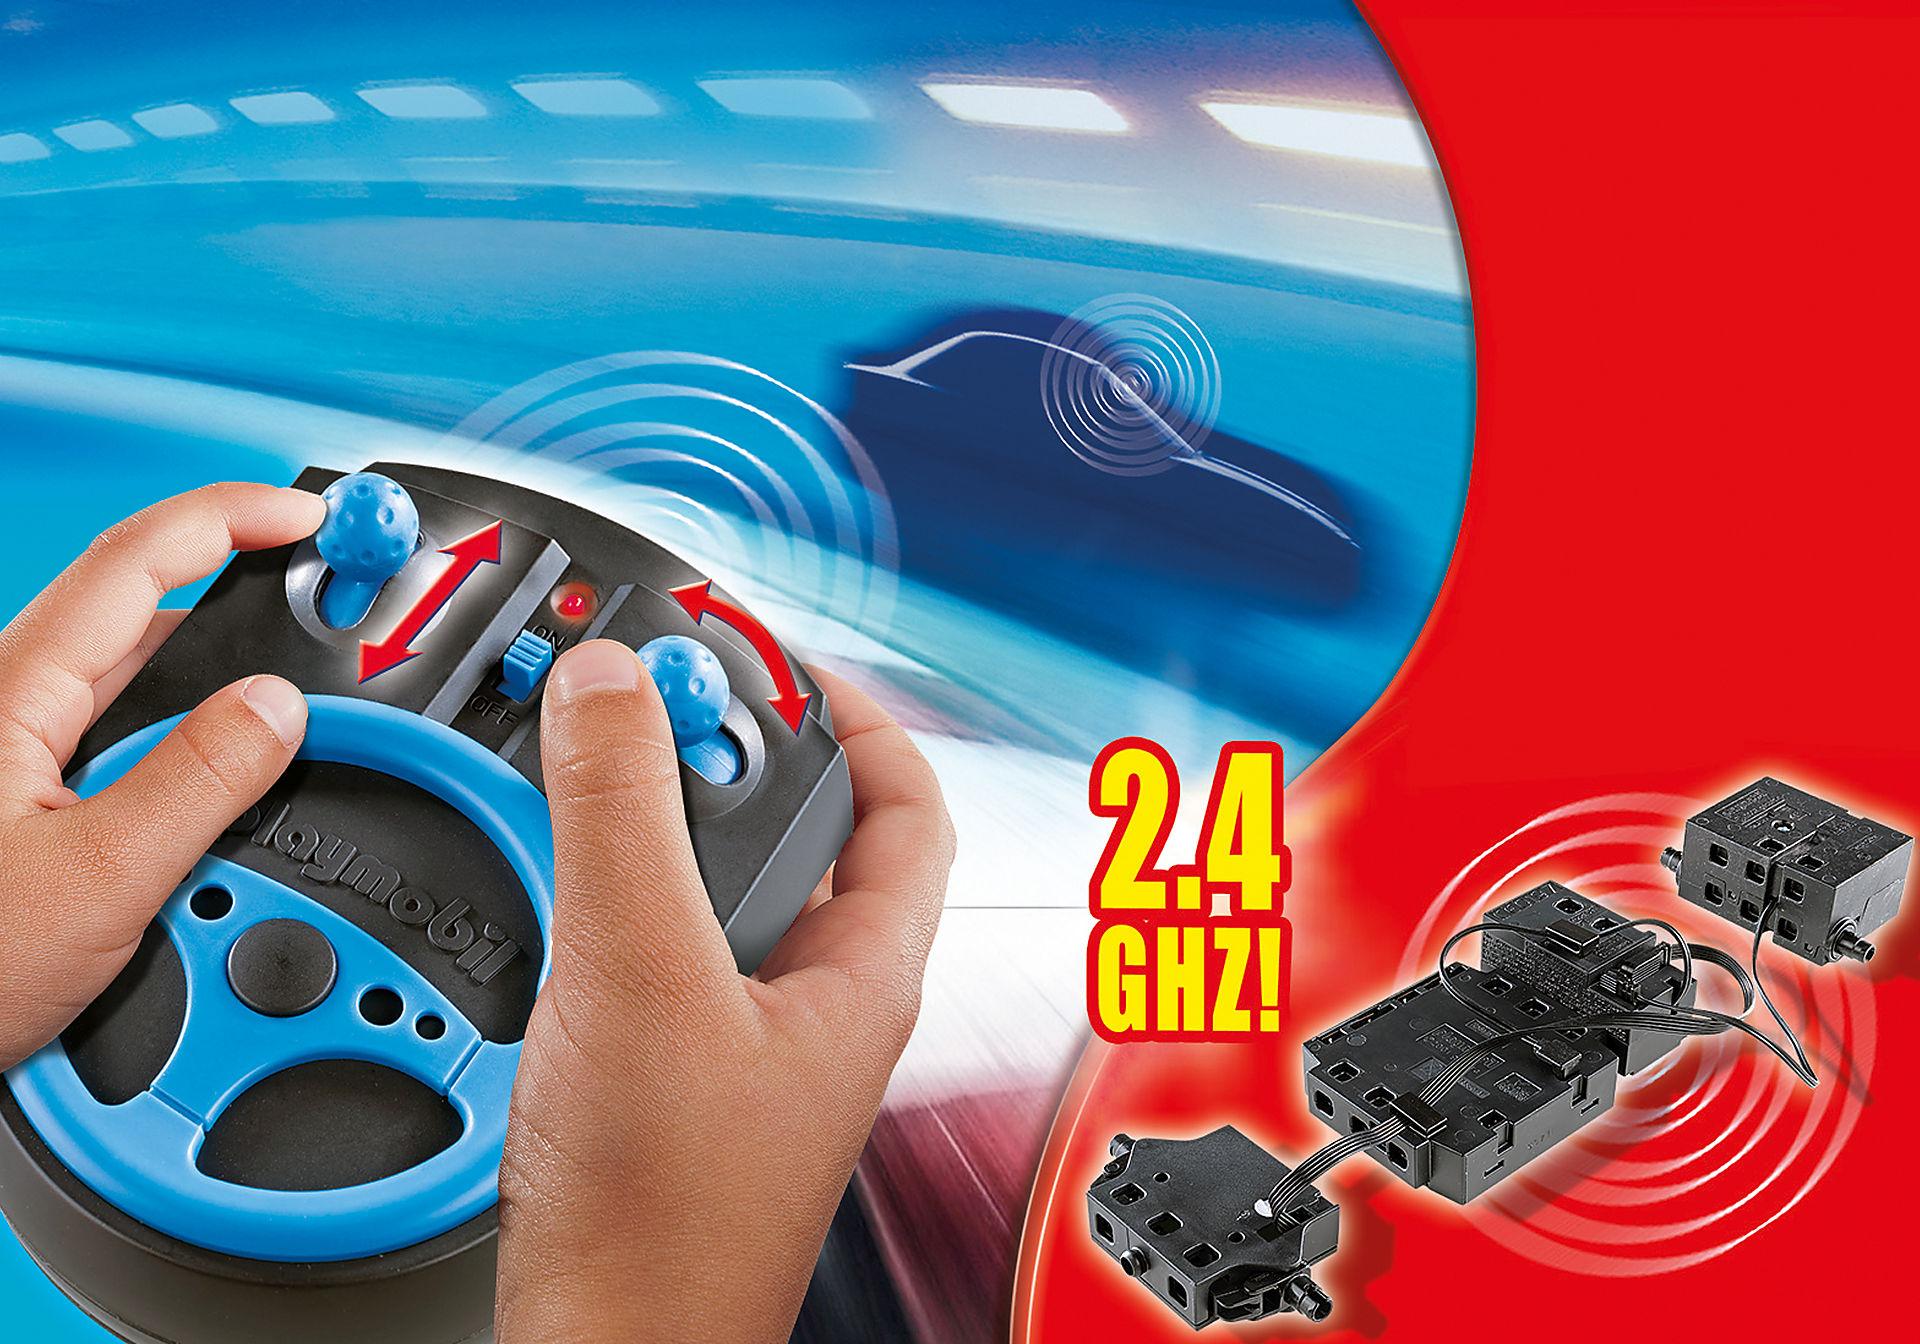 http://media.playmobil.com/i/playmobil/6914_product_detail/Modulo radiocomandato (2,4 GHz)